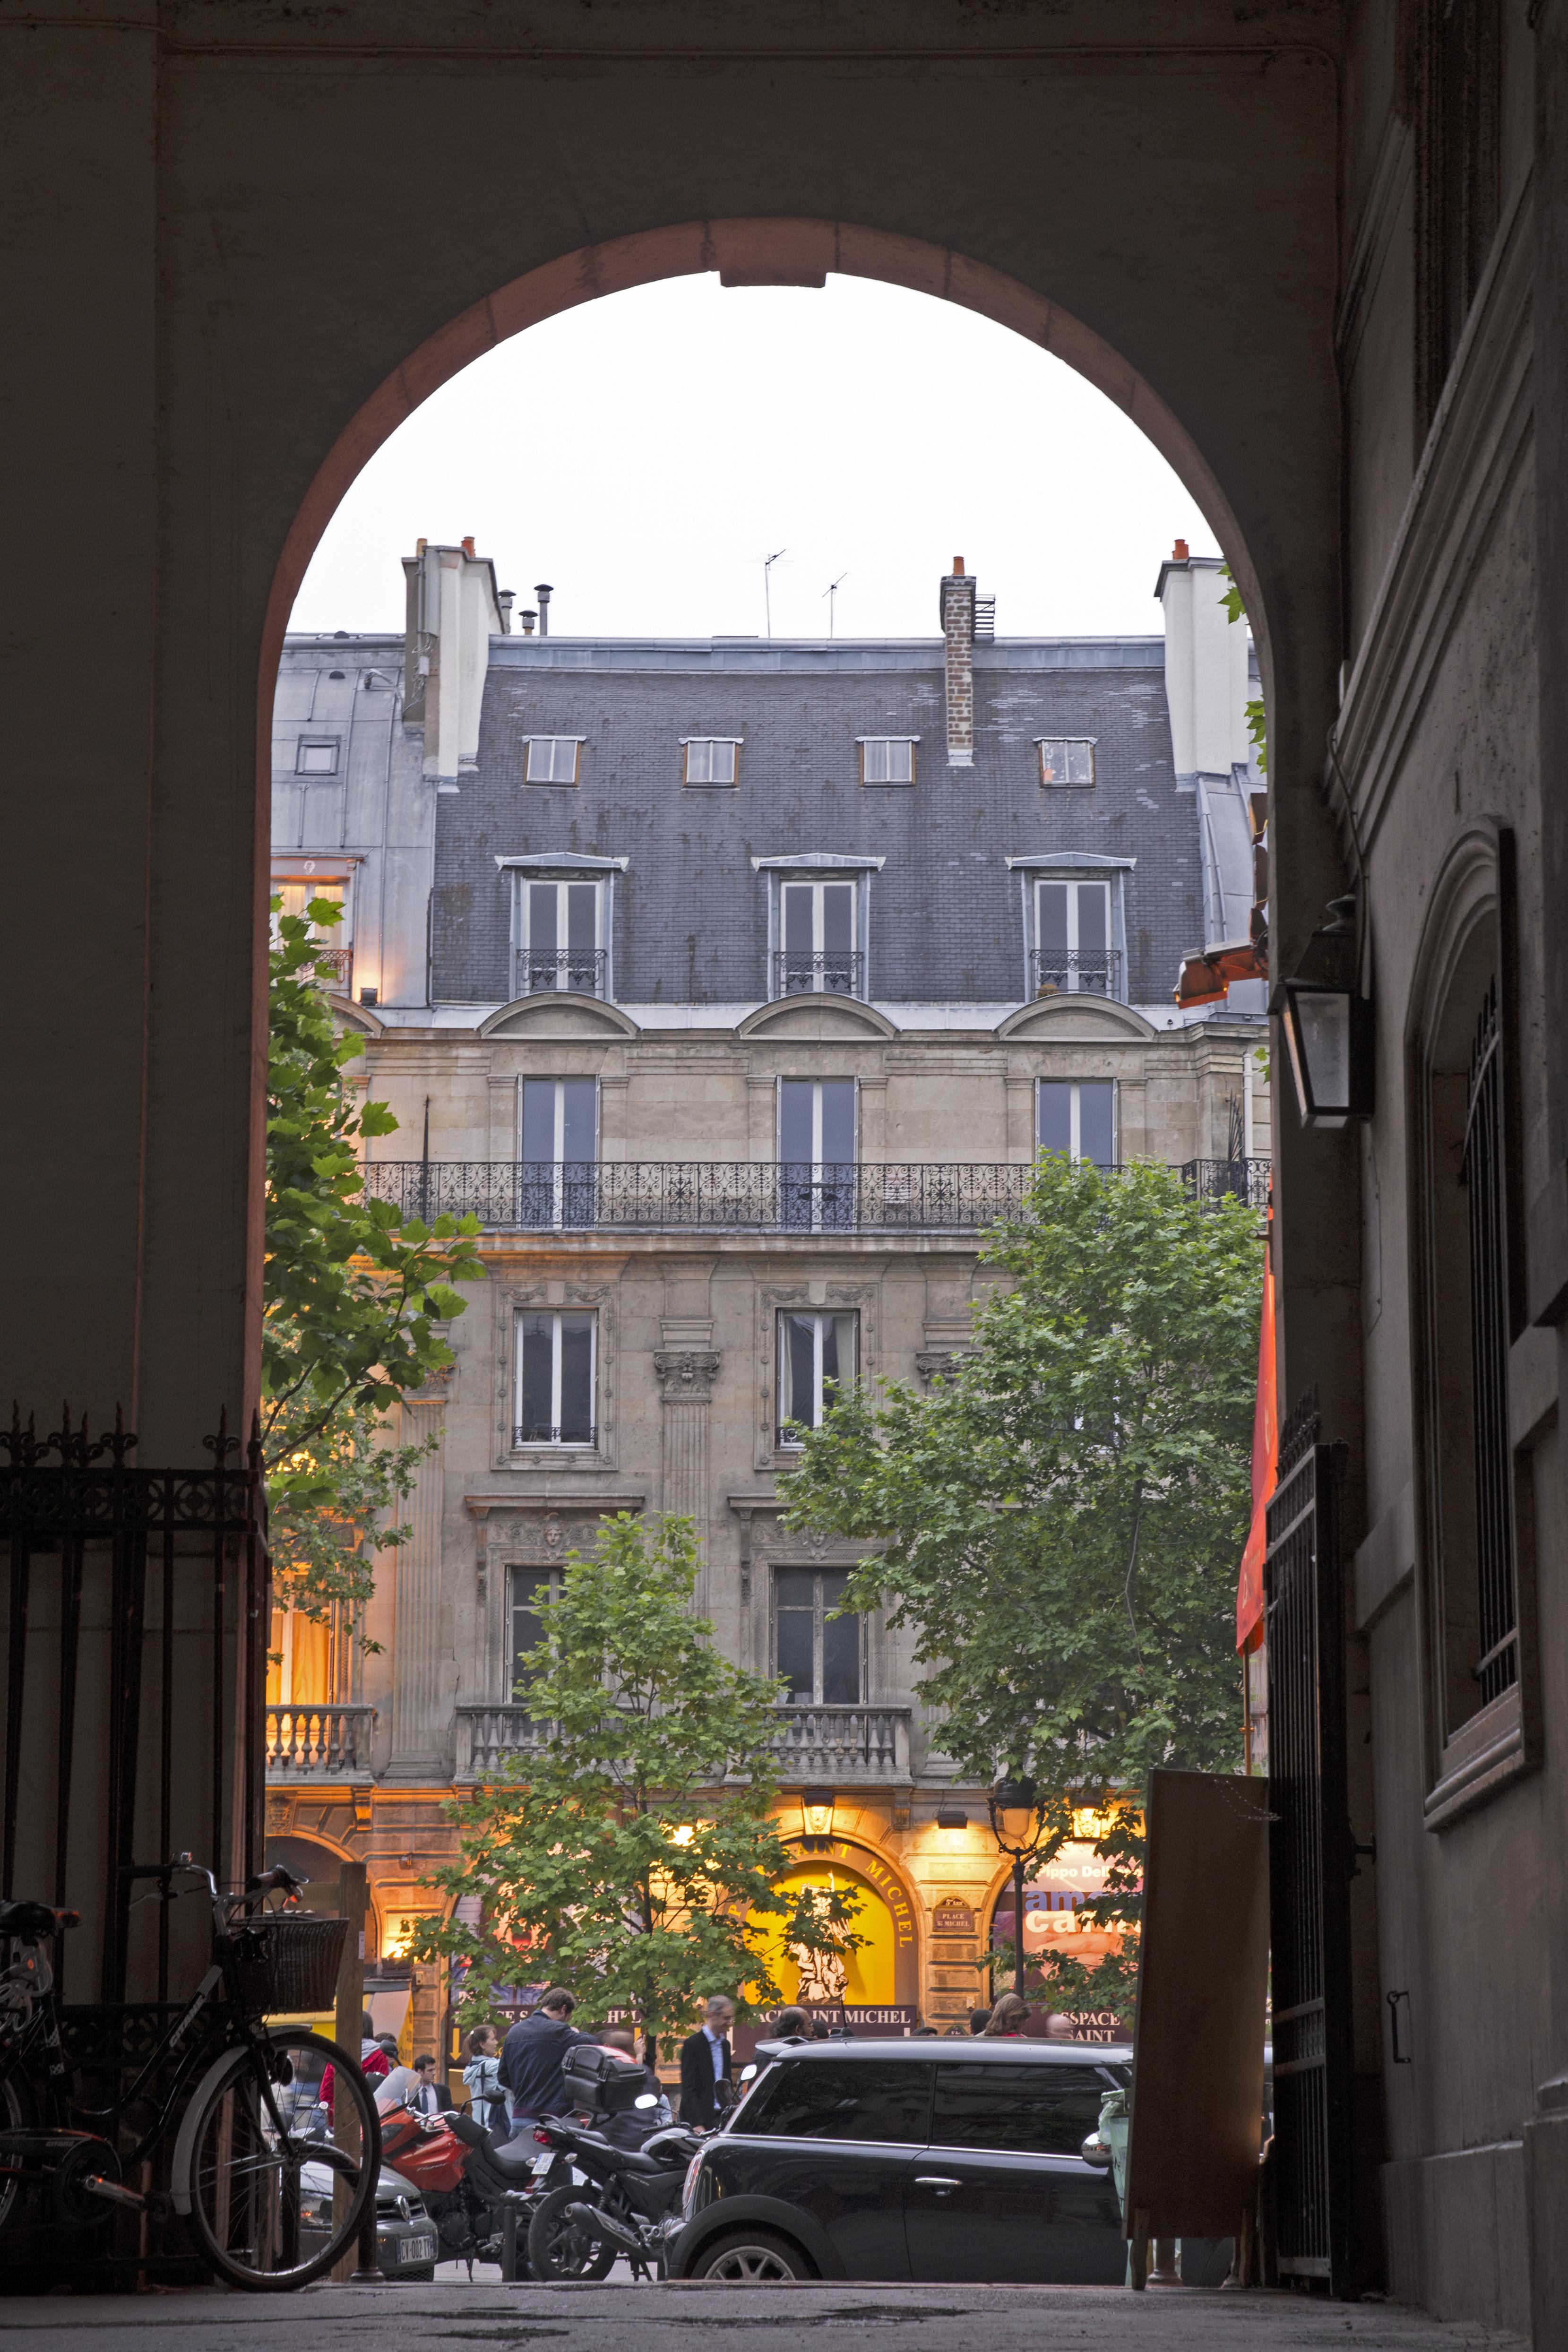 Peak a boo - Paris - 9390